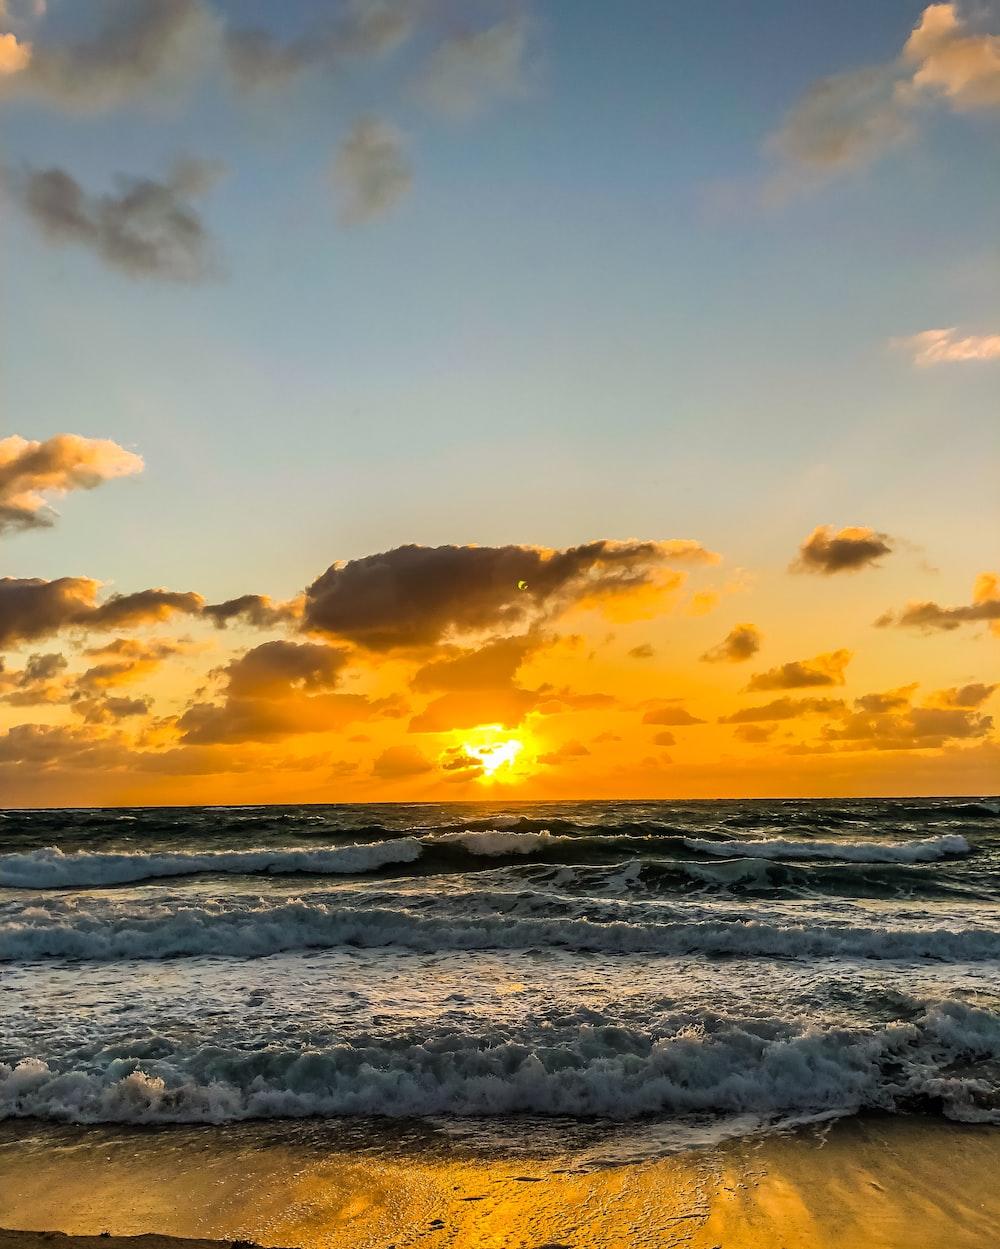 calm sea under orange and blue skies